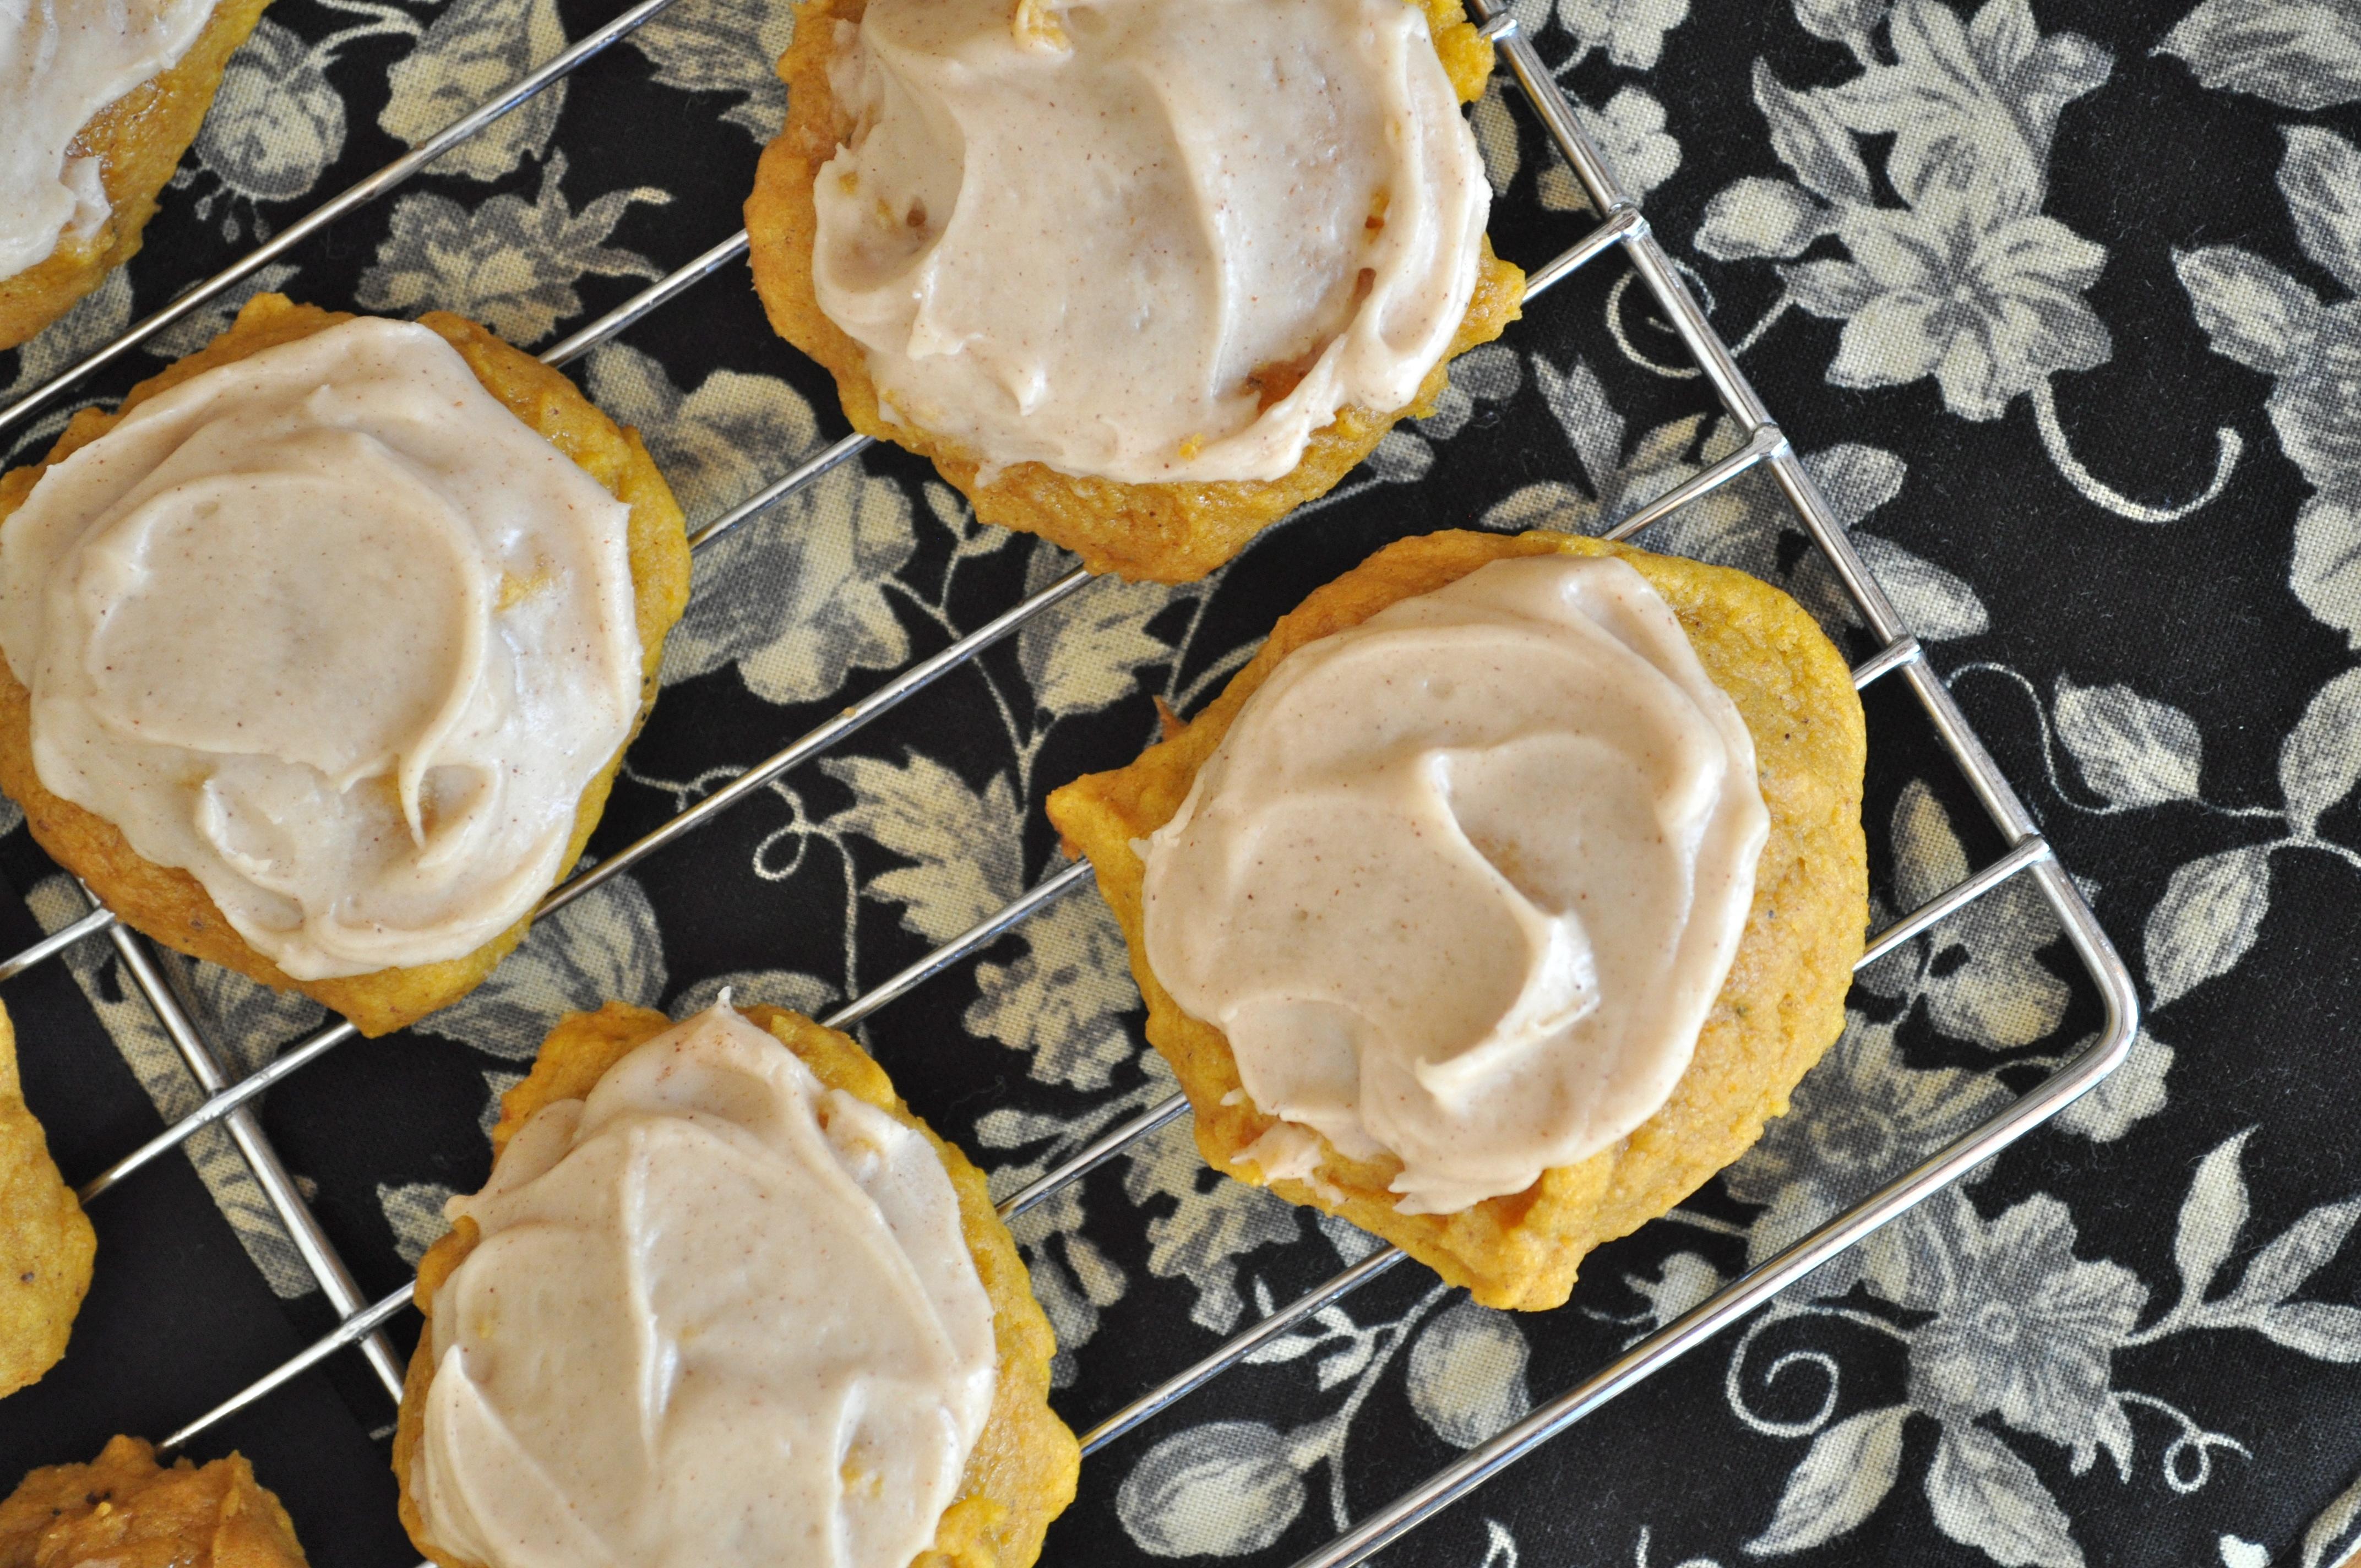 Falling | Pumpkin Cookies with Cinnamon Frosting